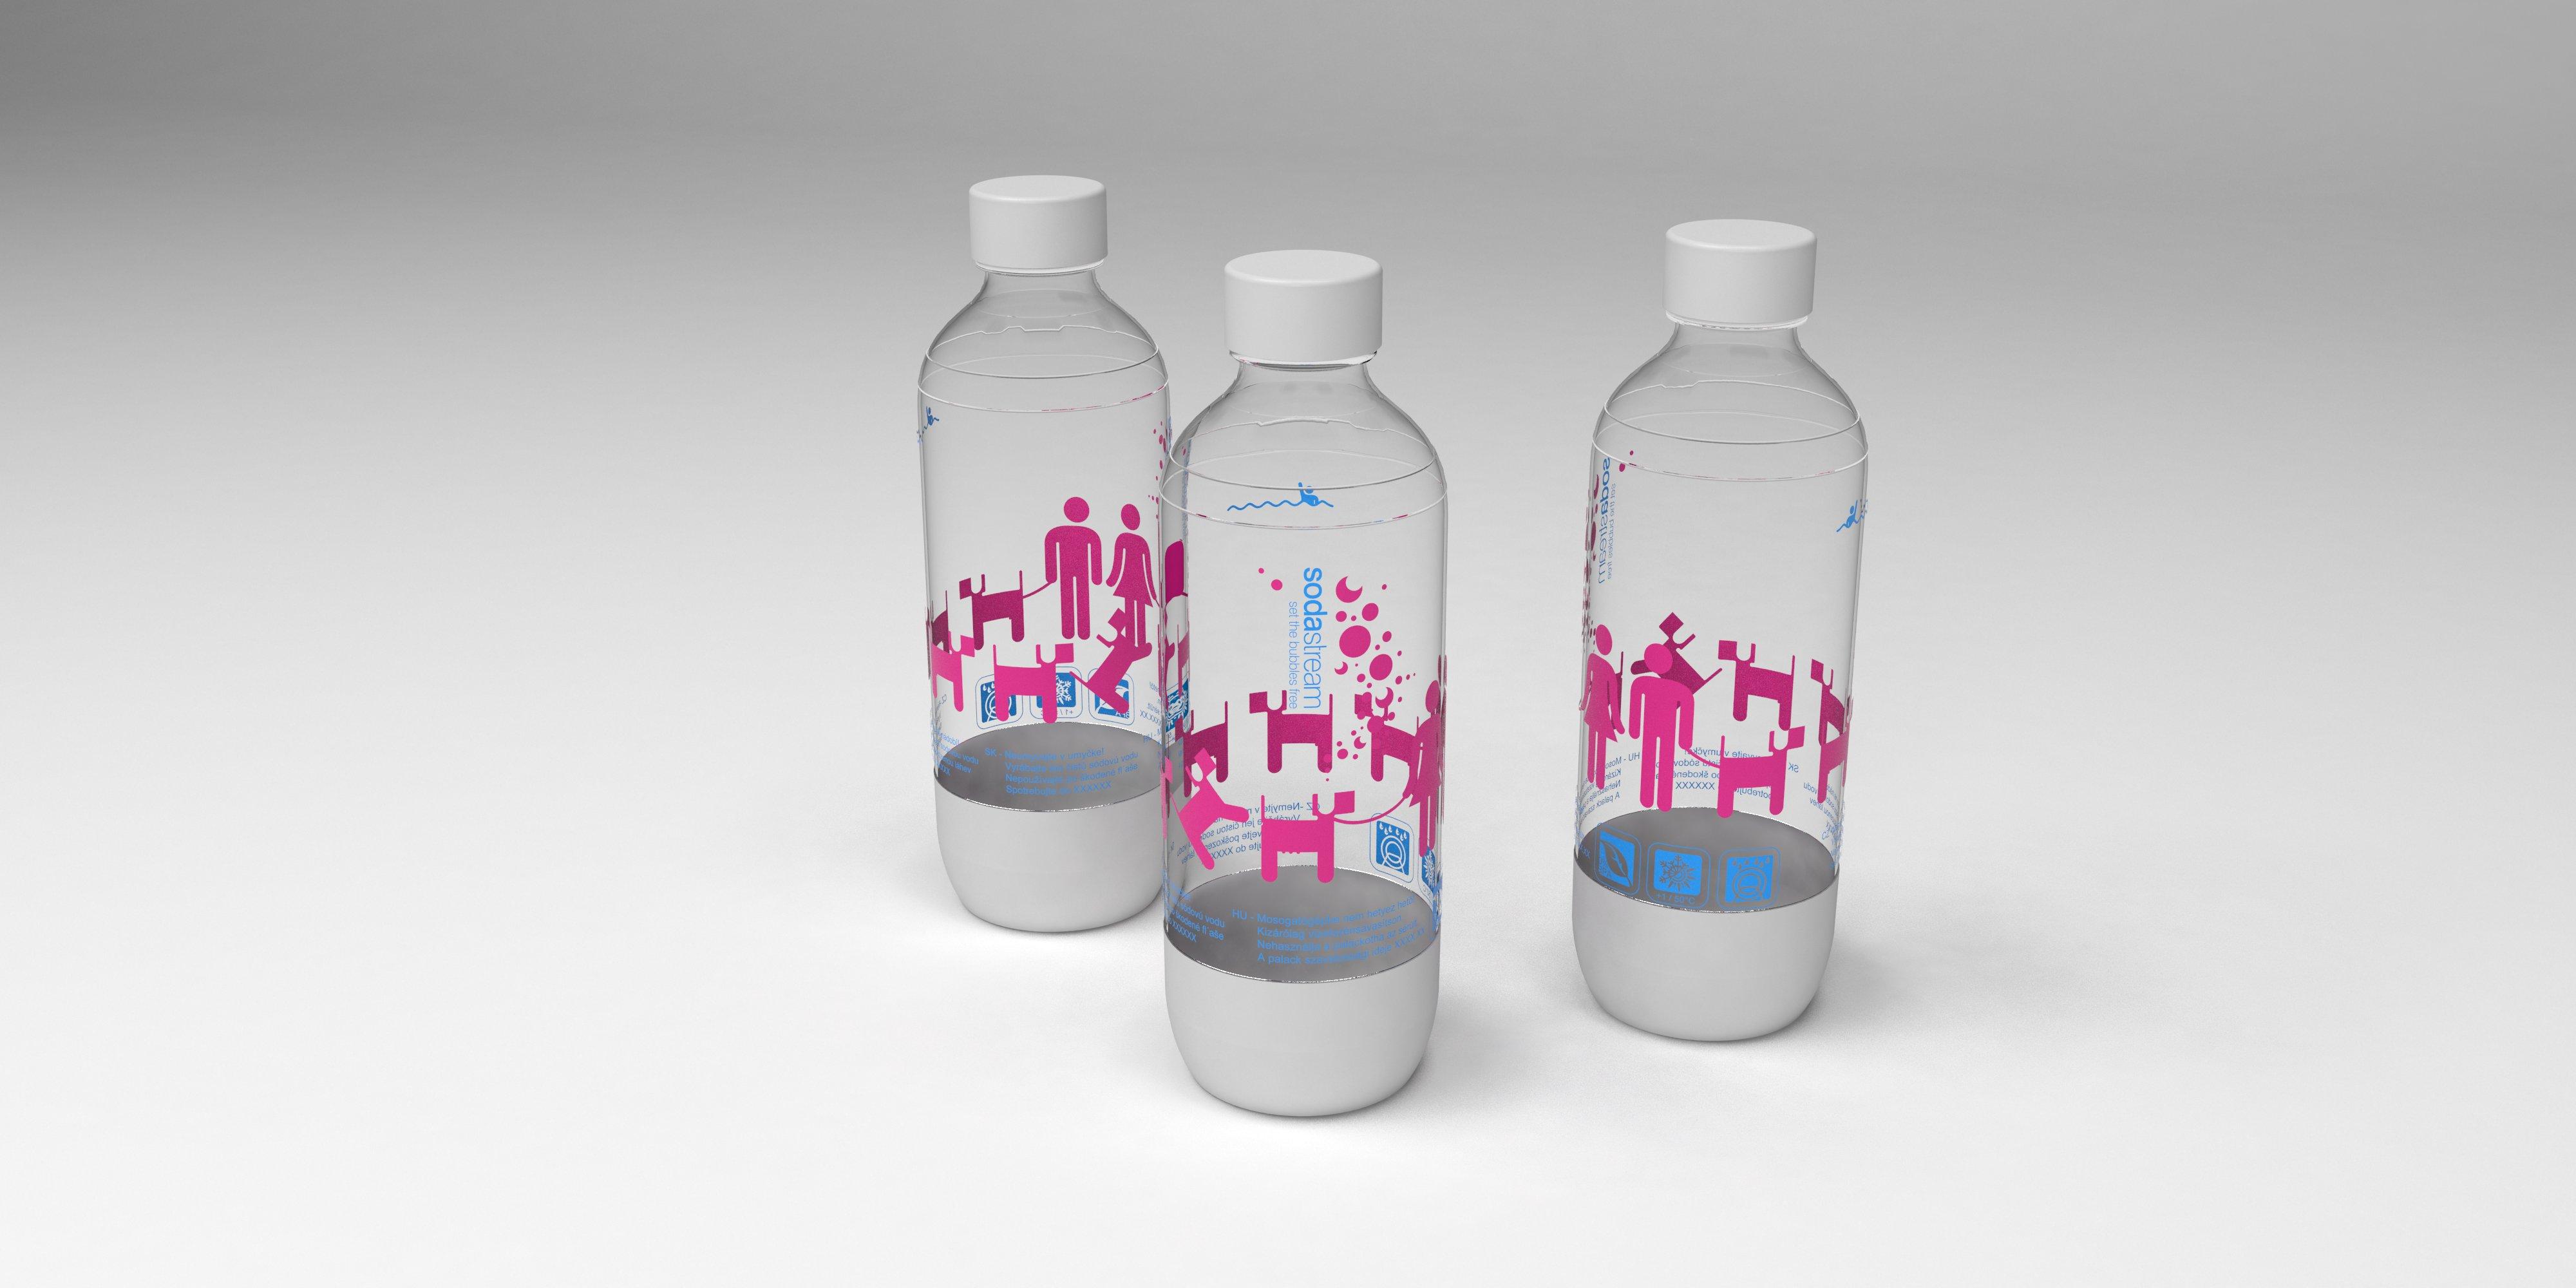 Design for Sodastream